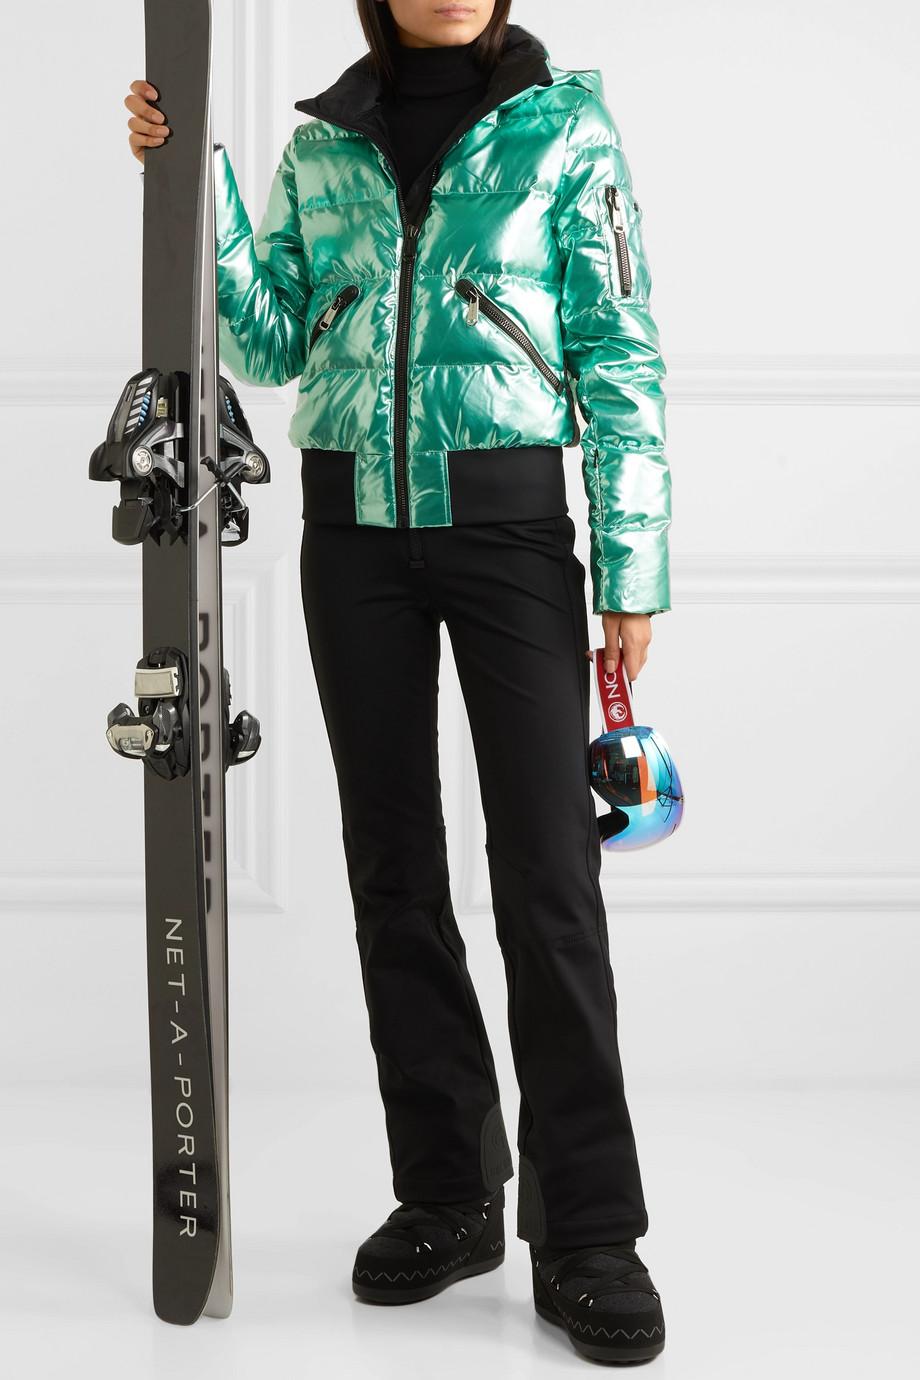 Goldbergh Aura hooded appliquéd quilted metallic down ski jacket